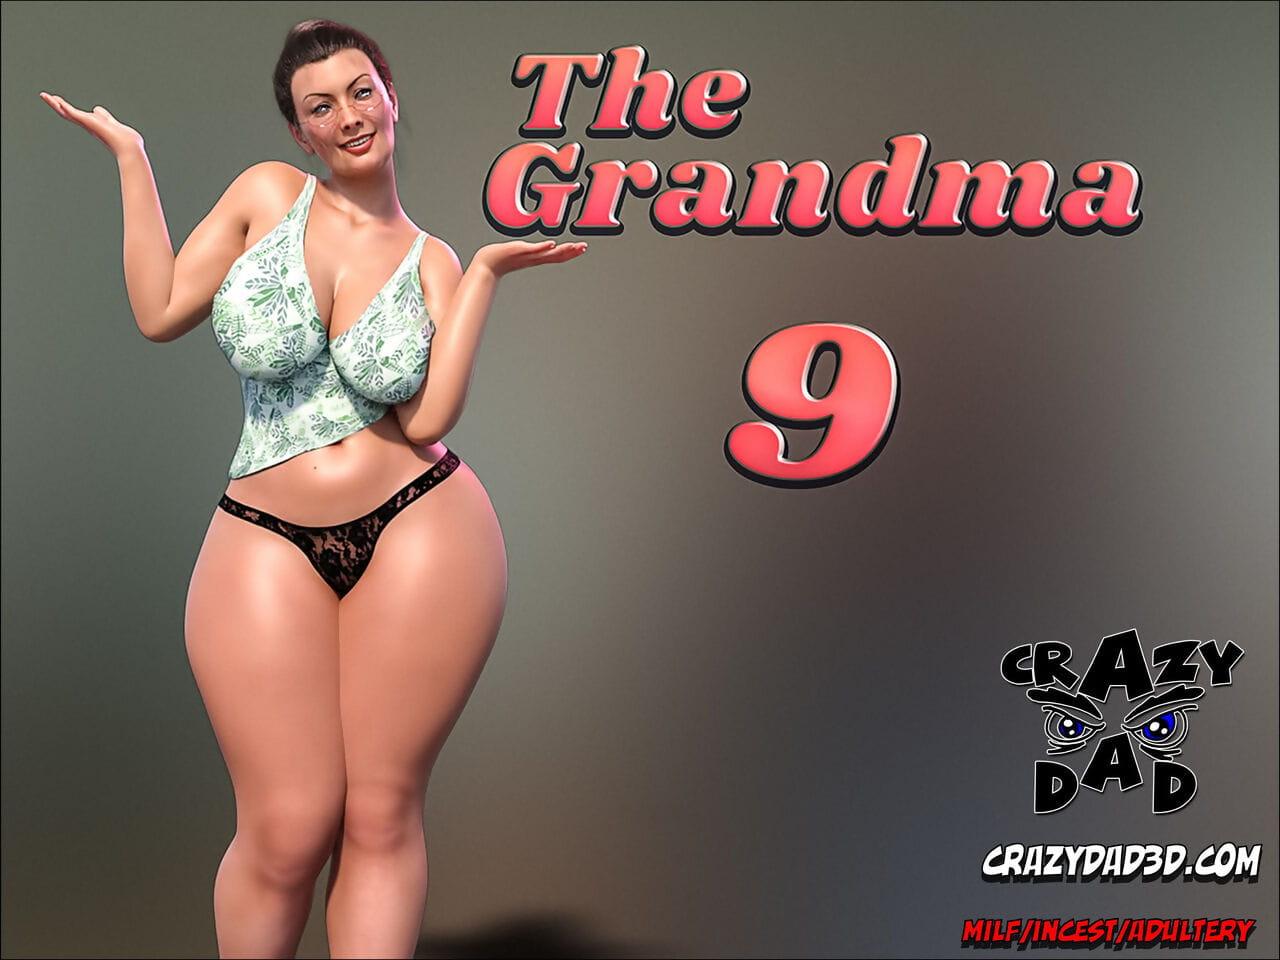 Inane Paterfamilias 3D Make an issue of Grandma 9 English